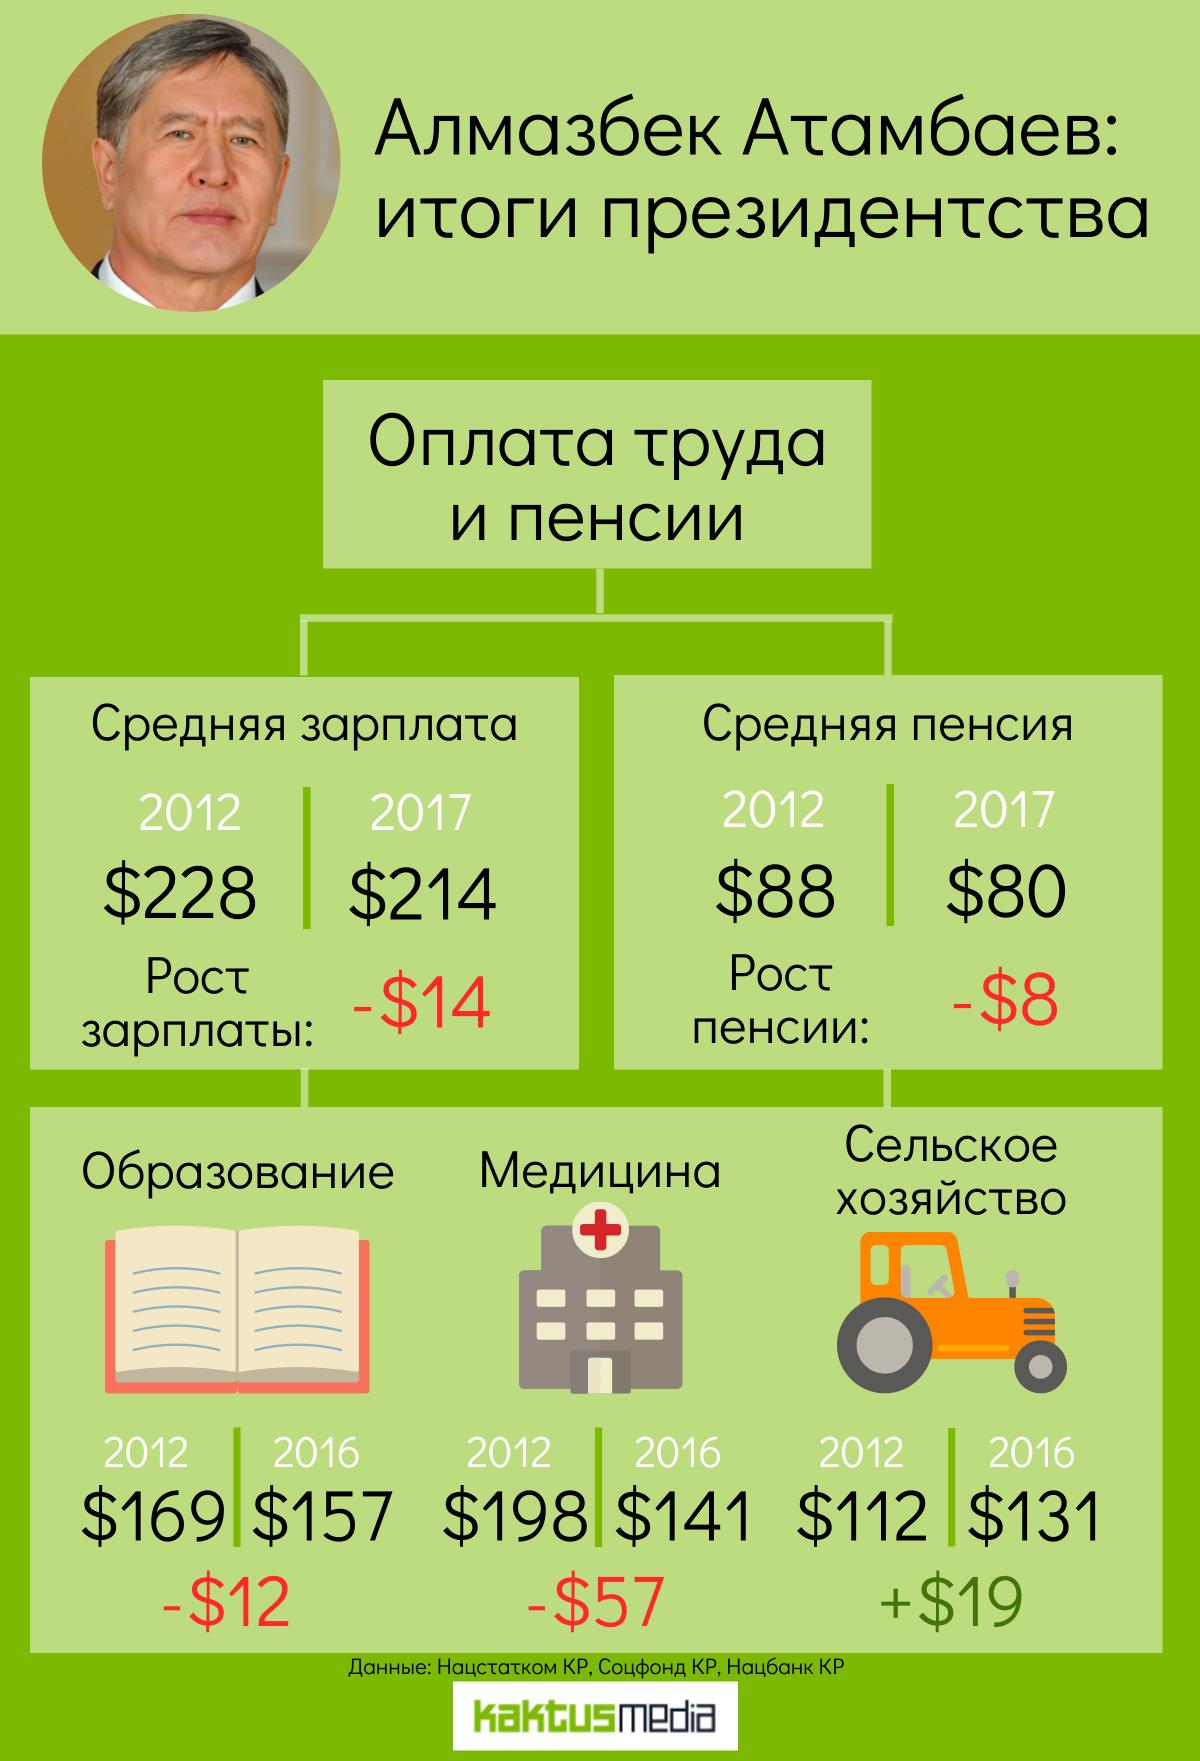 Атамбаев: итоги президентства. Что стало с нашими зарплатами и пенсиями?